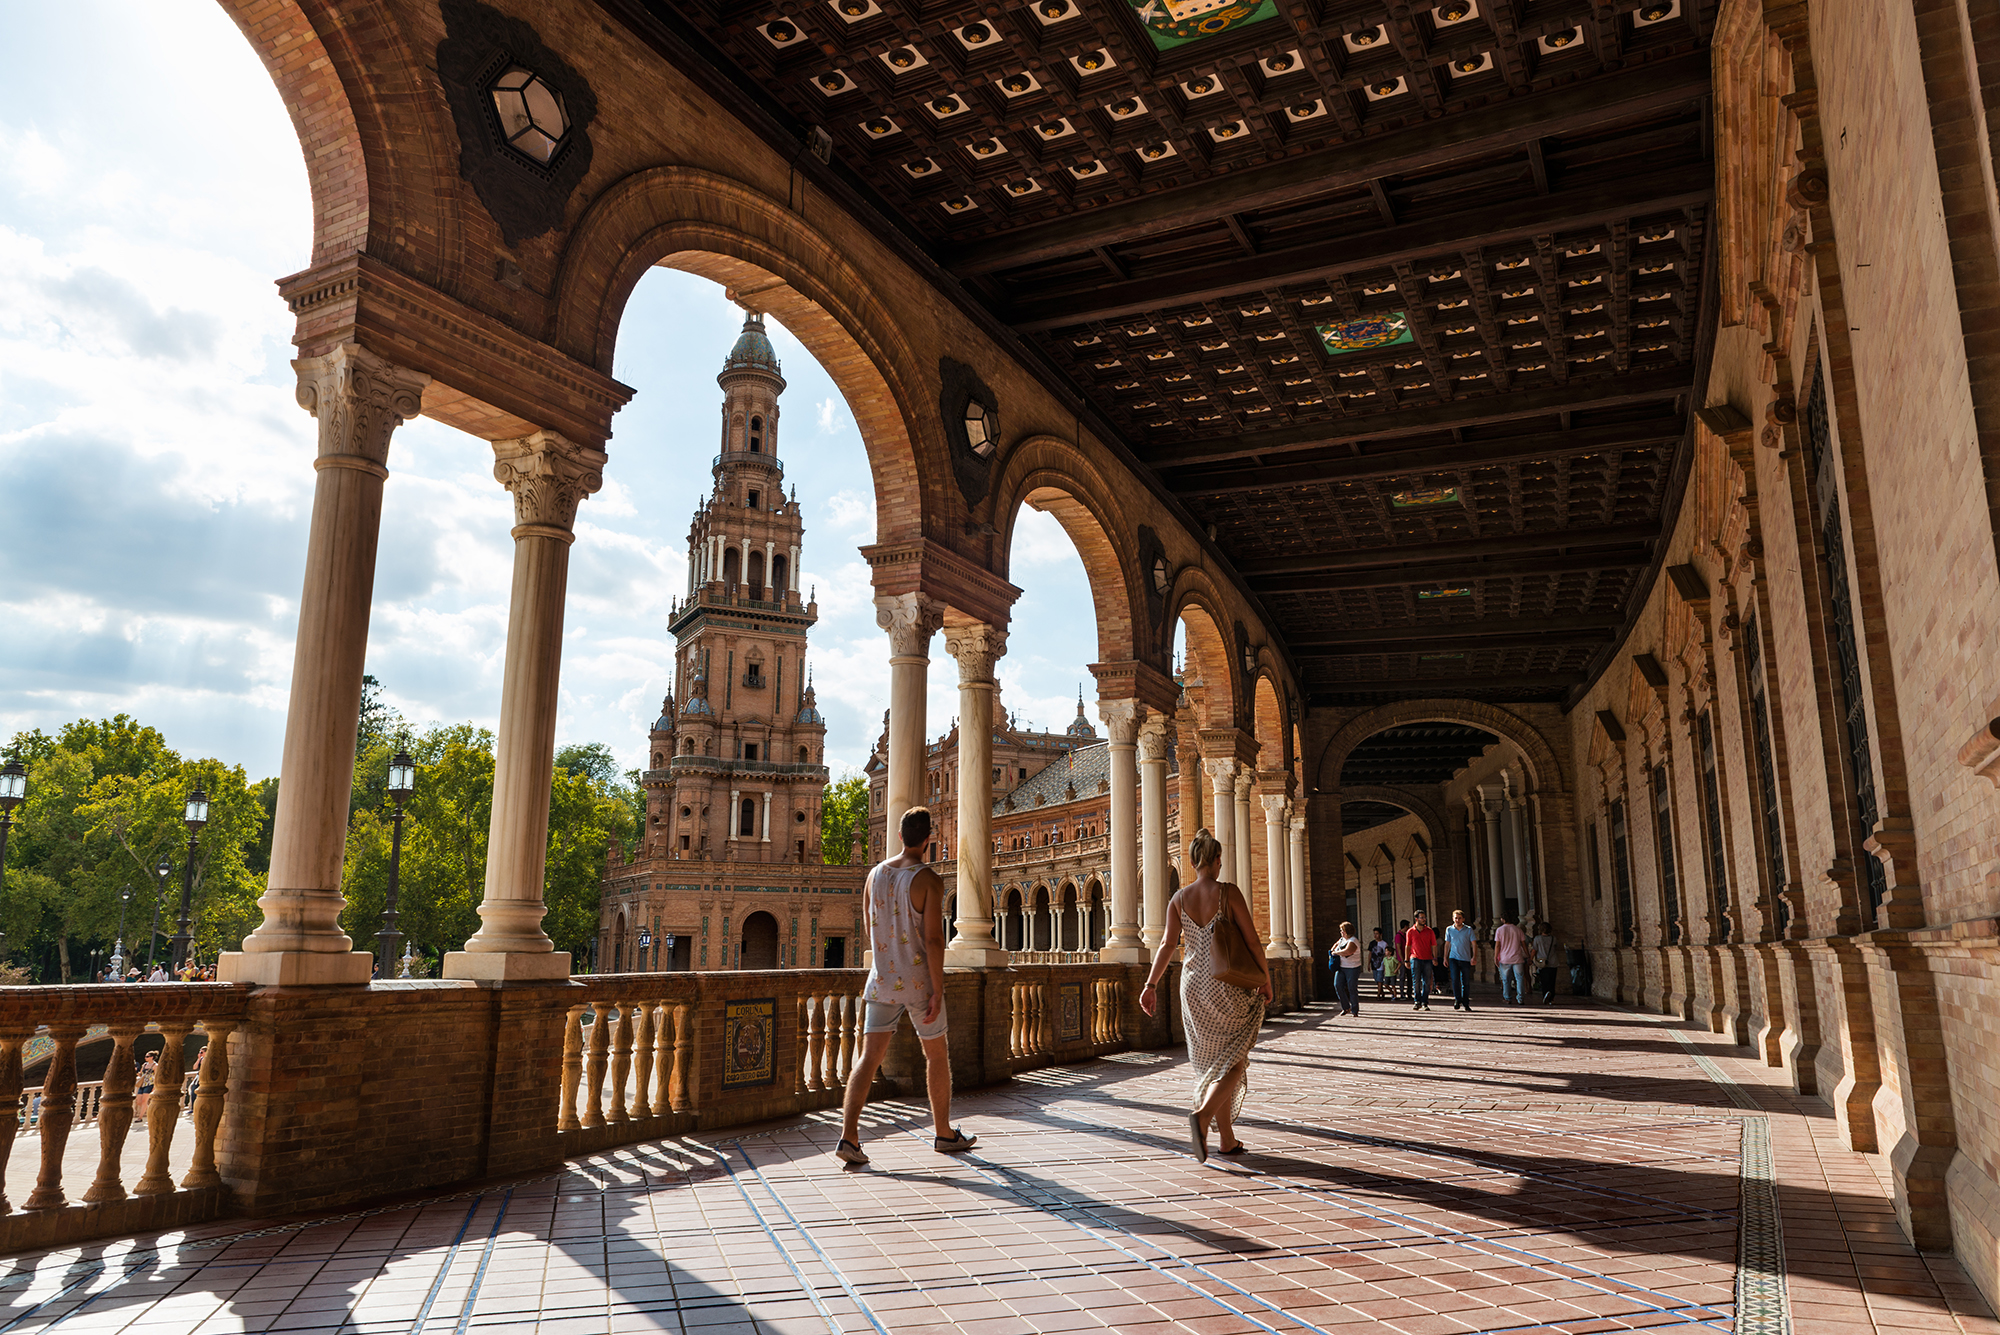 Tourists in the Plaza de España